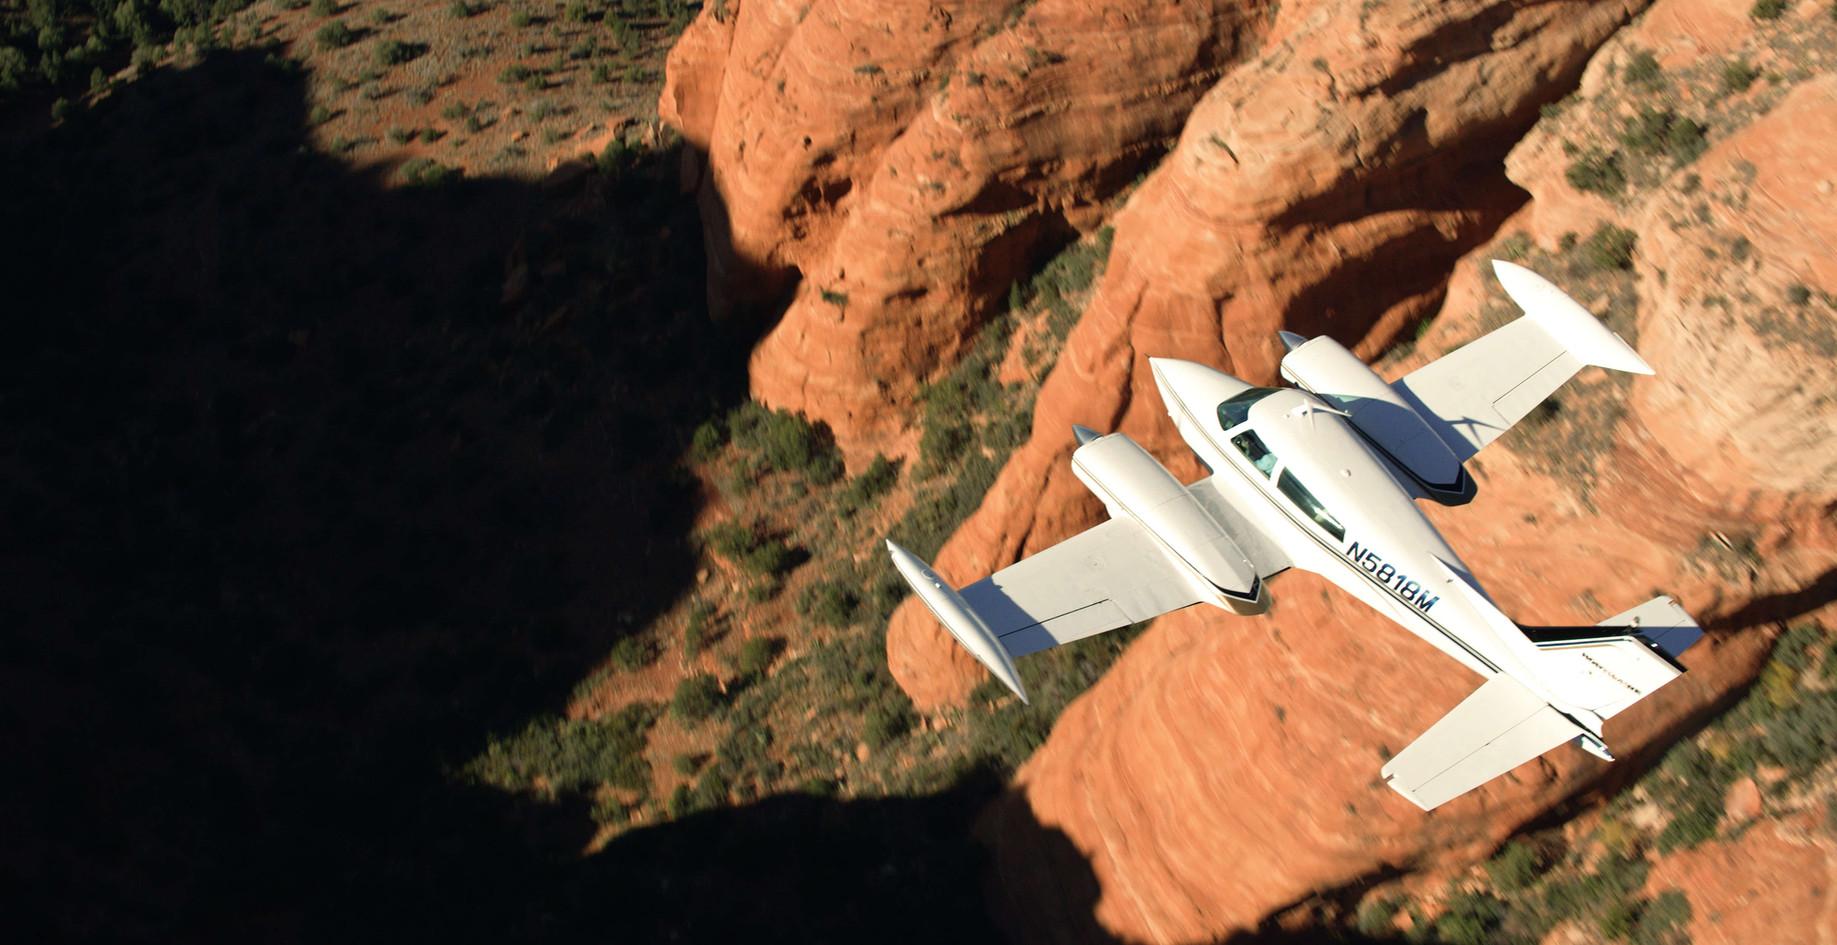 North-Aire-Aviation-Sedona-Aerial-cessna